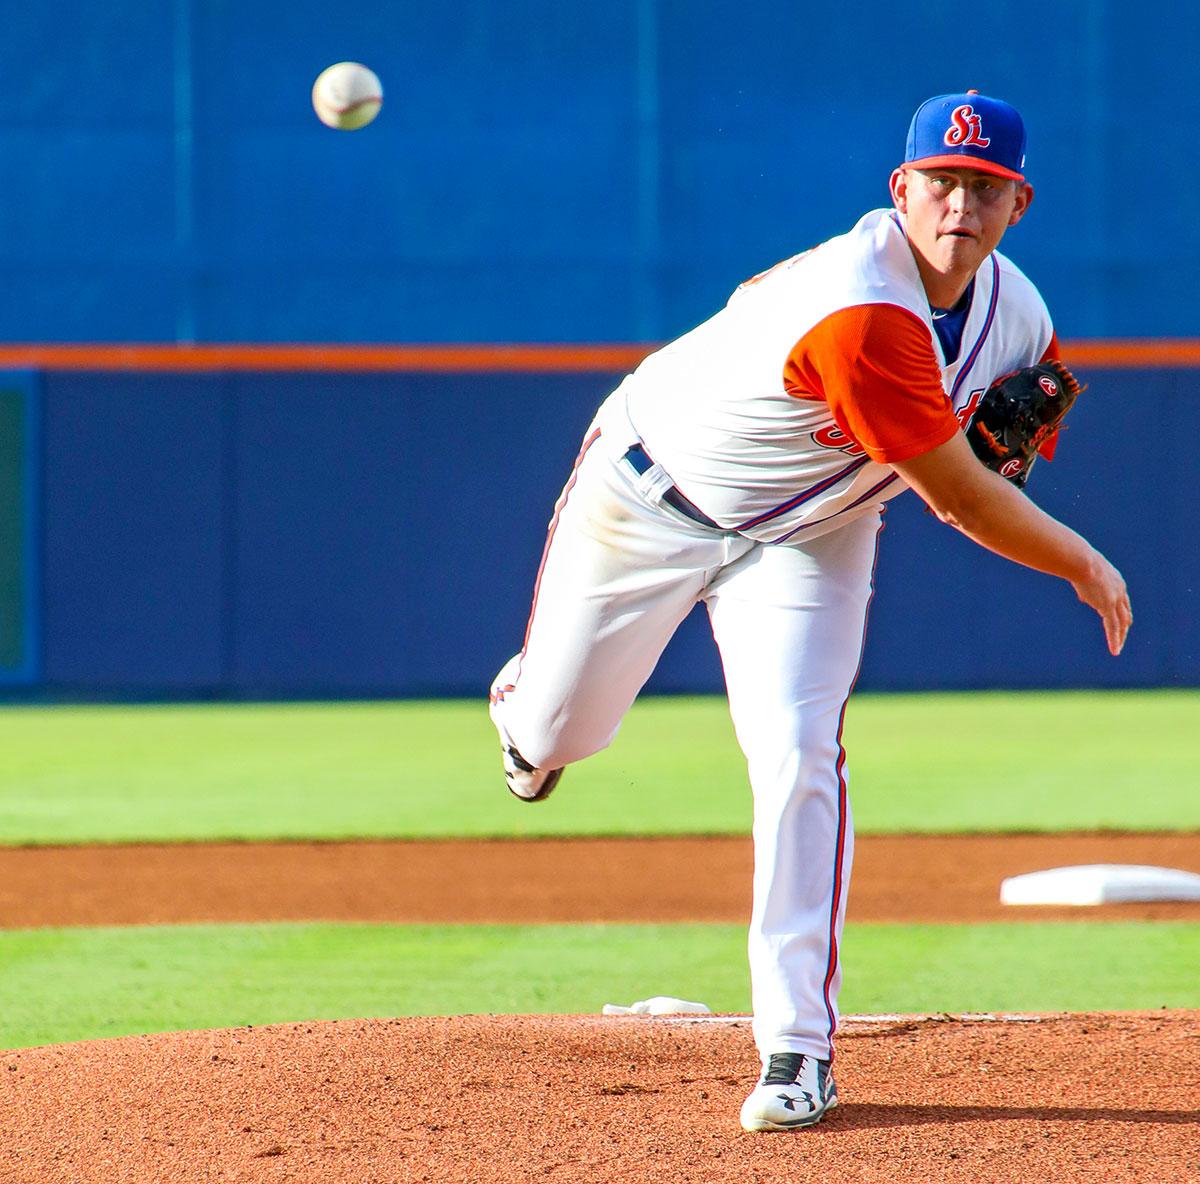 Chris Flexen Jr. was a pitcher for the St. Lucie Mets